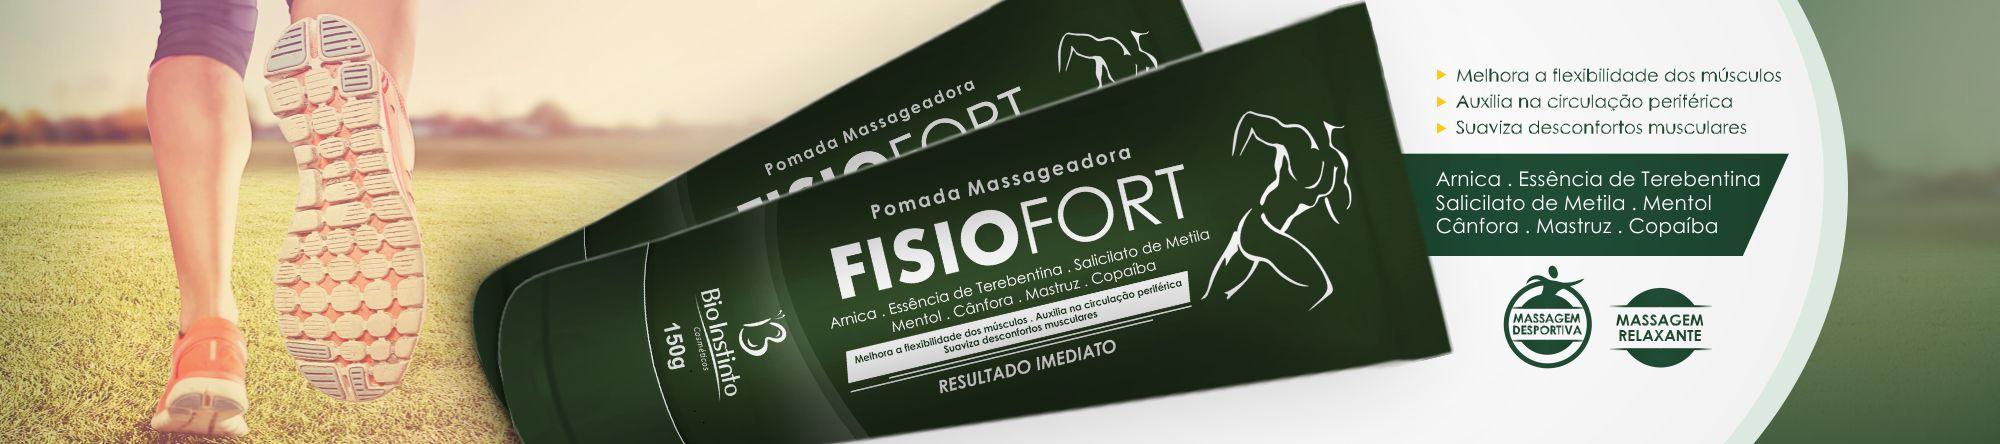 FisioFort